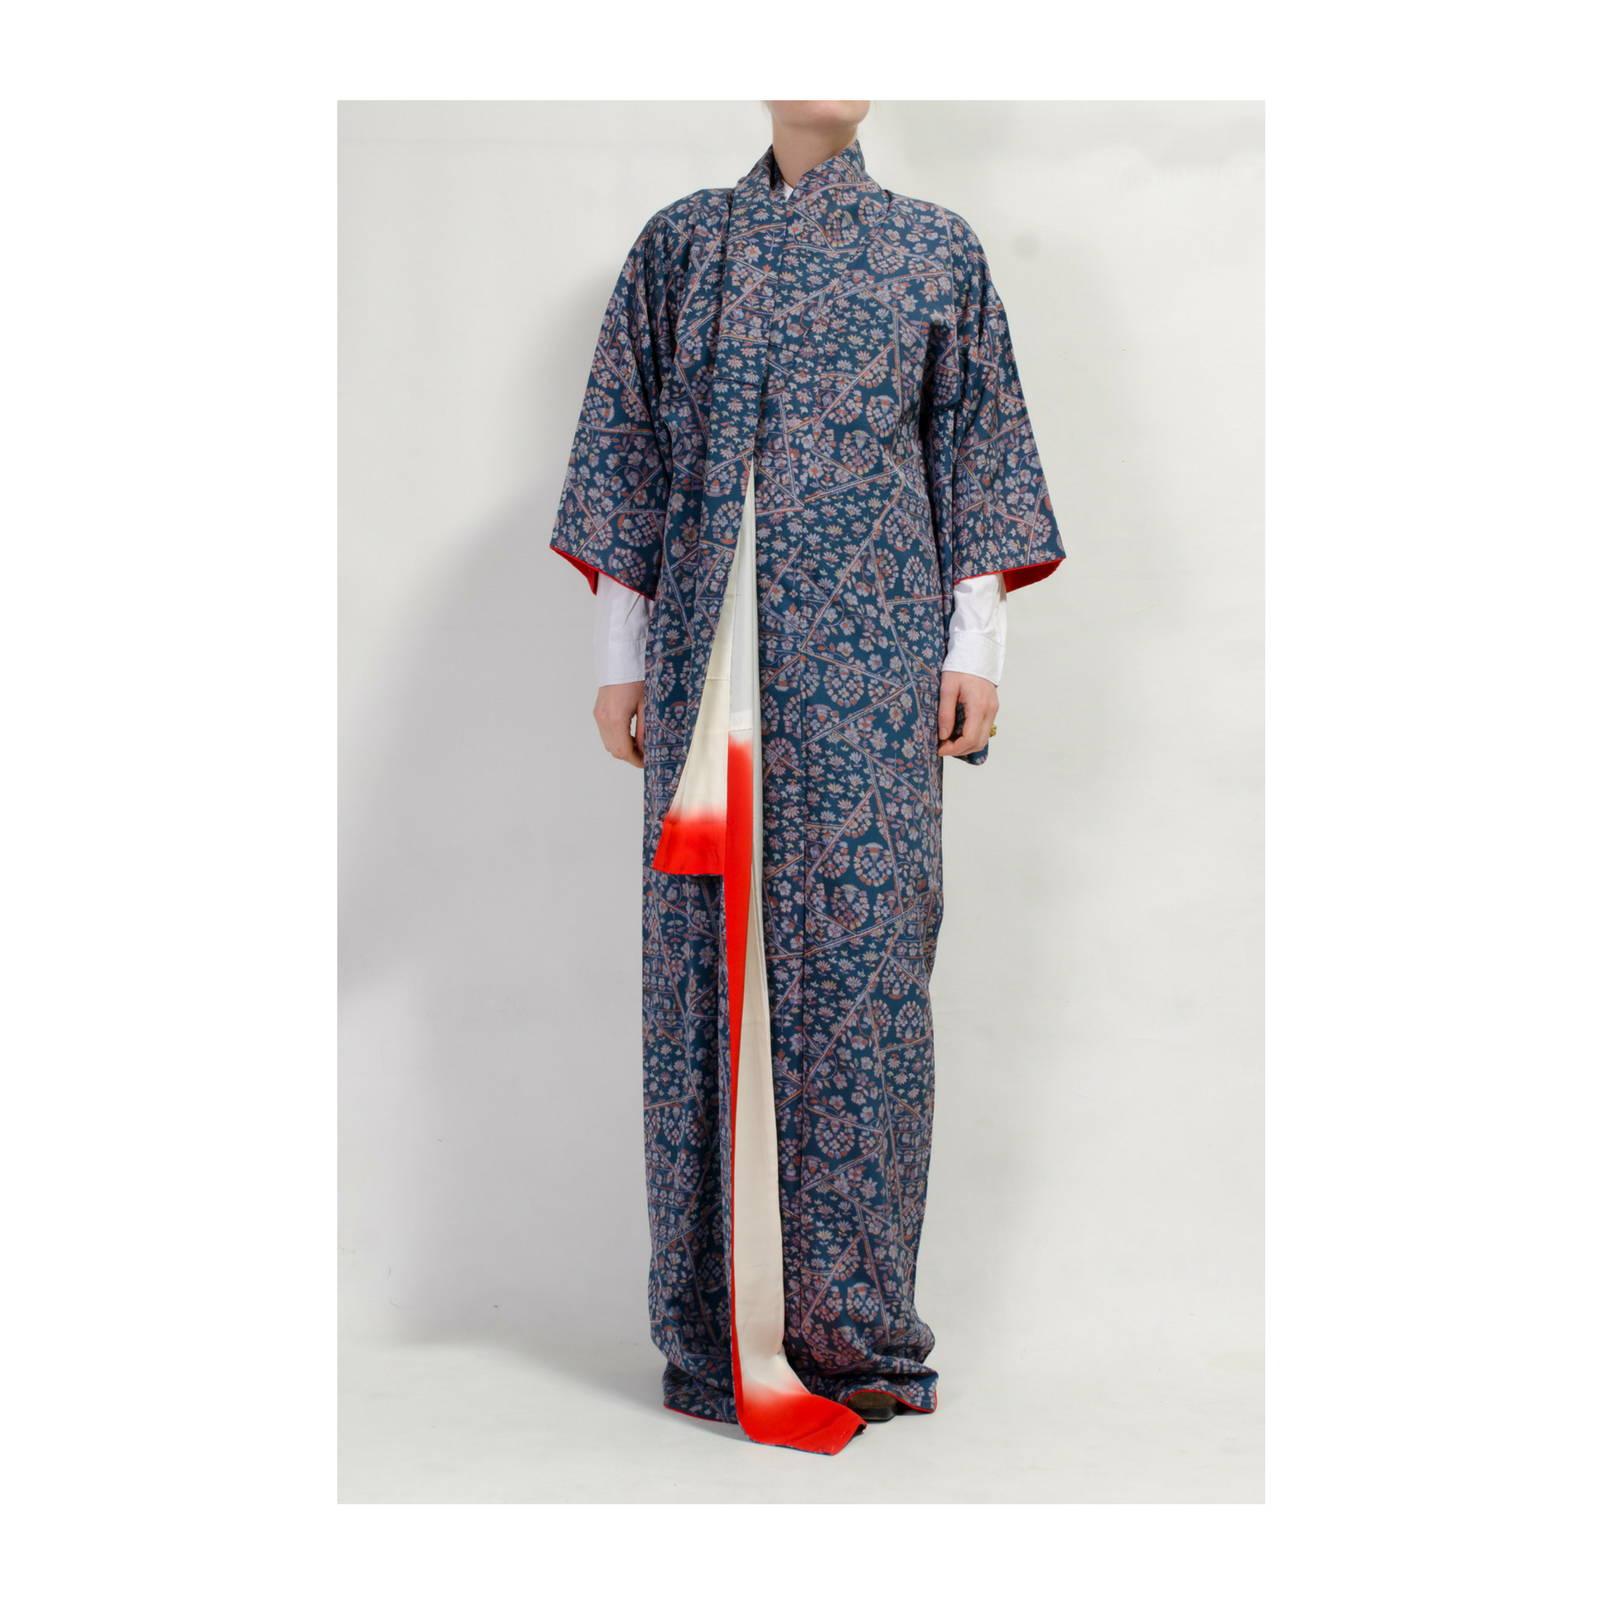 Japanese Kimono - Silk Robes - Online at Modern Archive Berlin